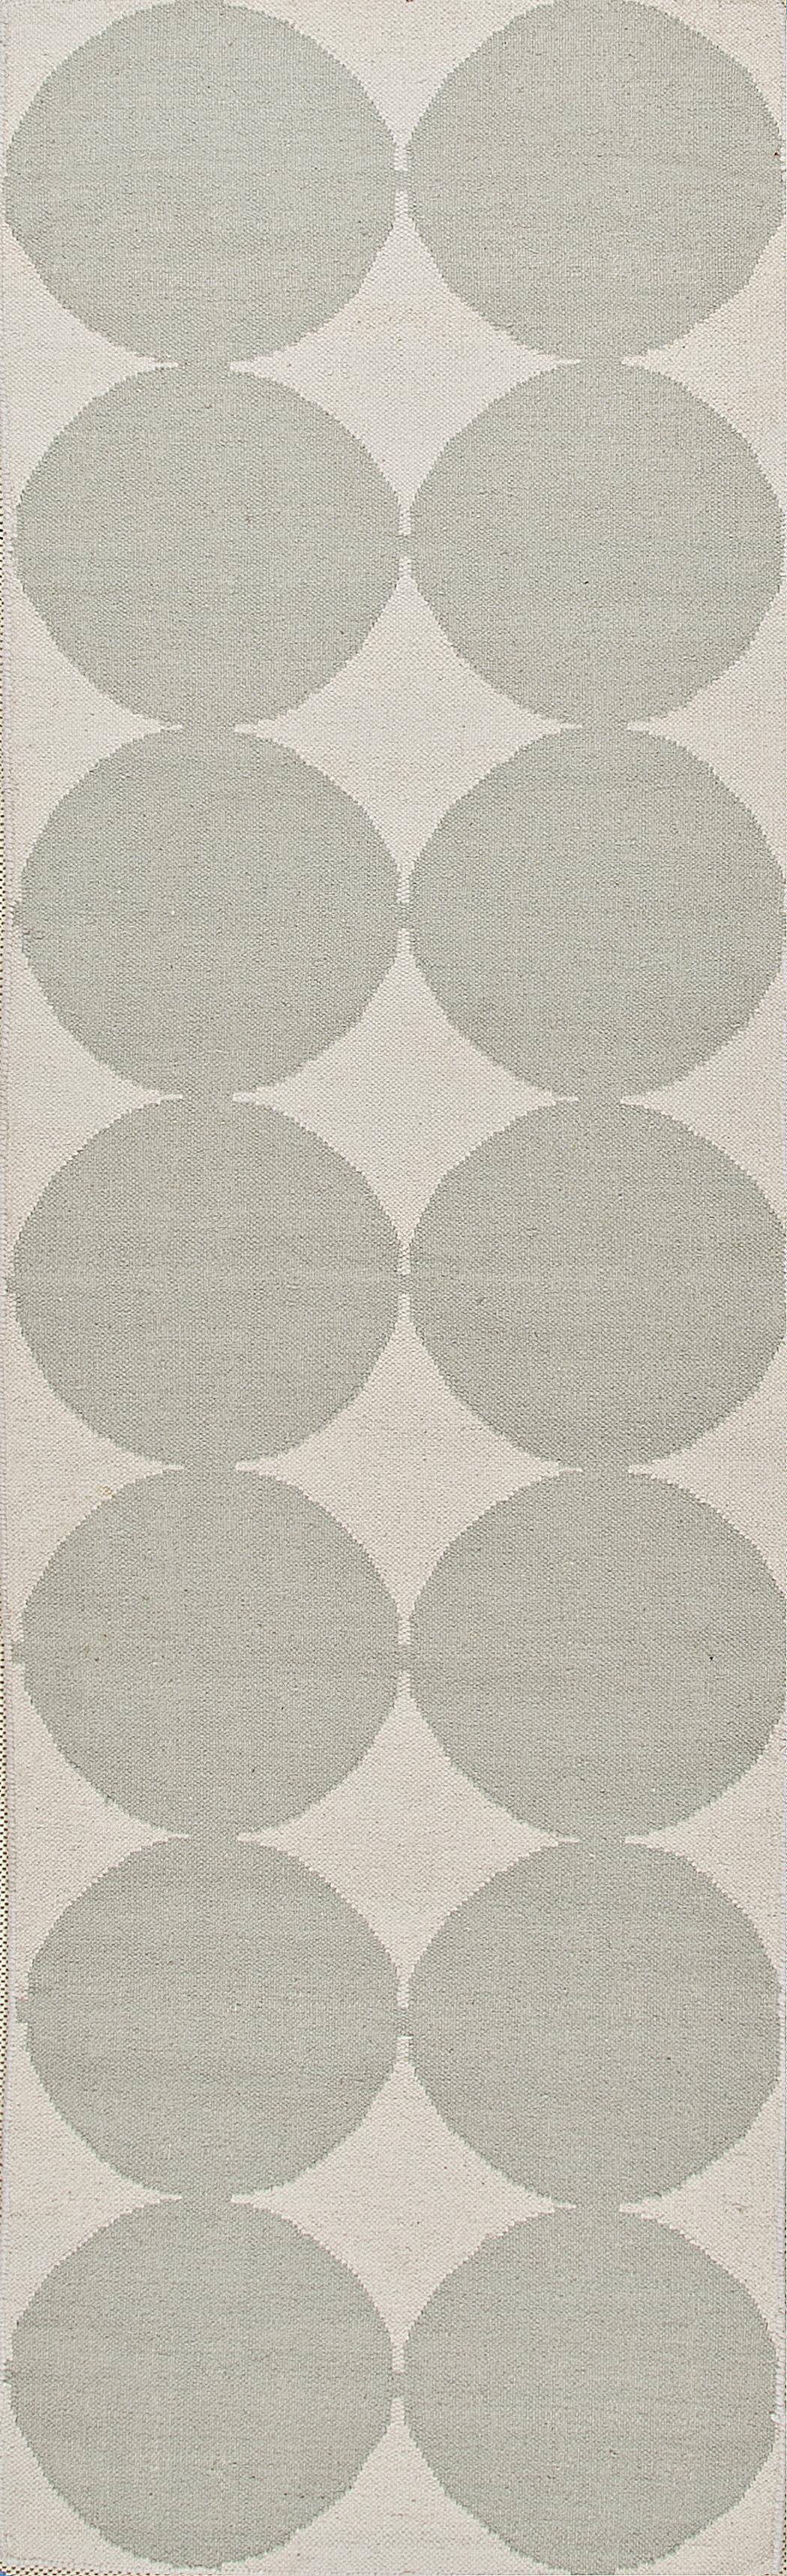 JAIPUR Rugs Maroc 2.6 x 8 Rug - Item Number: RUG102581